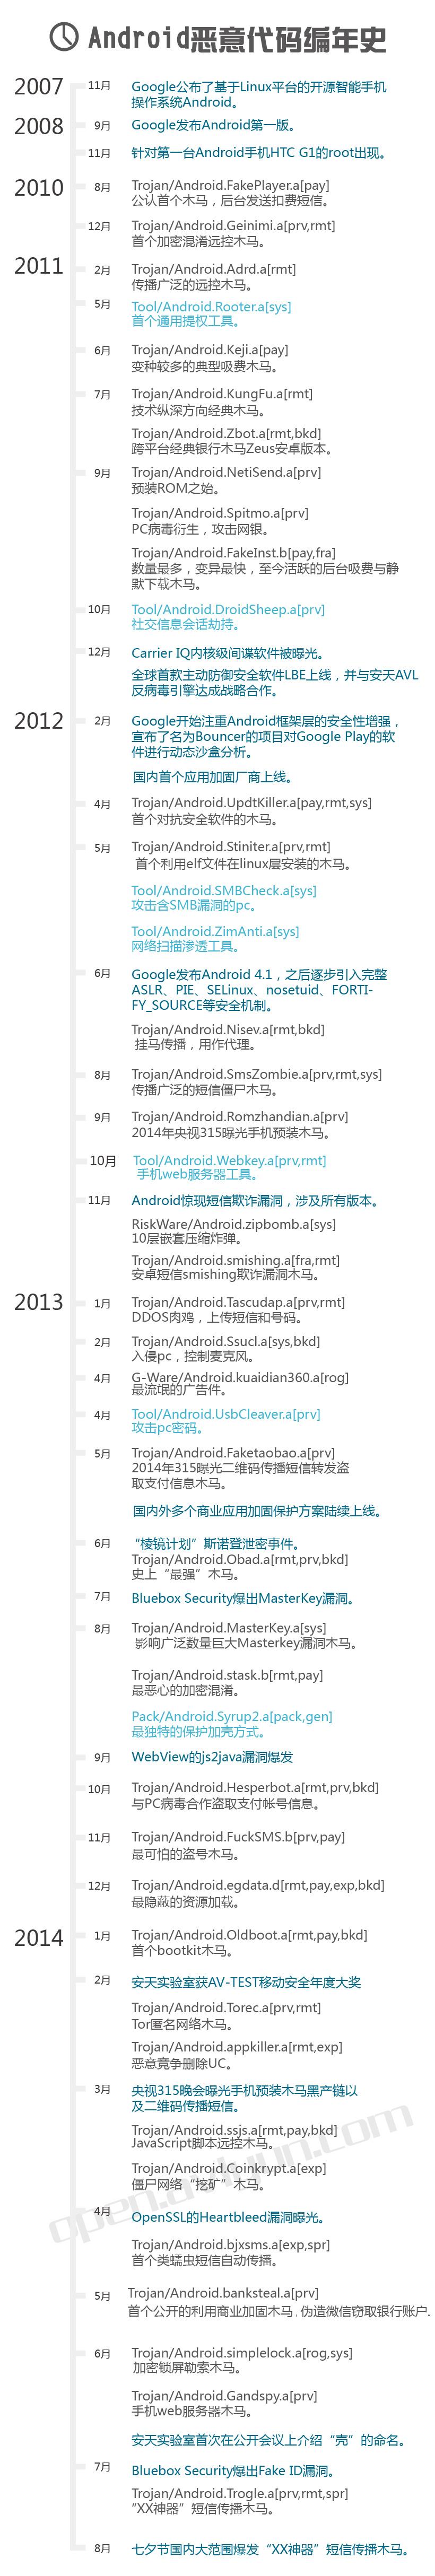 Android恶意代码编年史-0.jpg